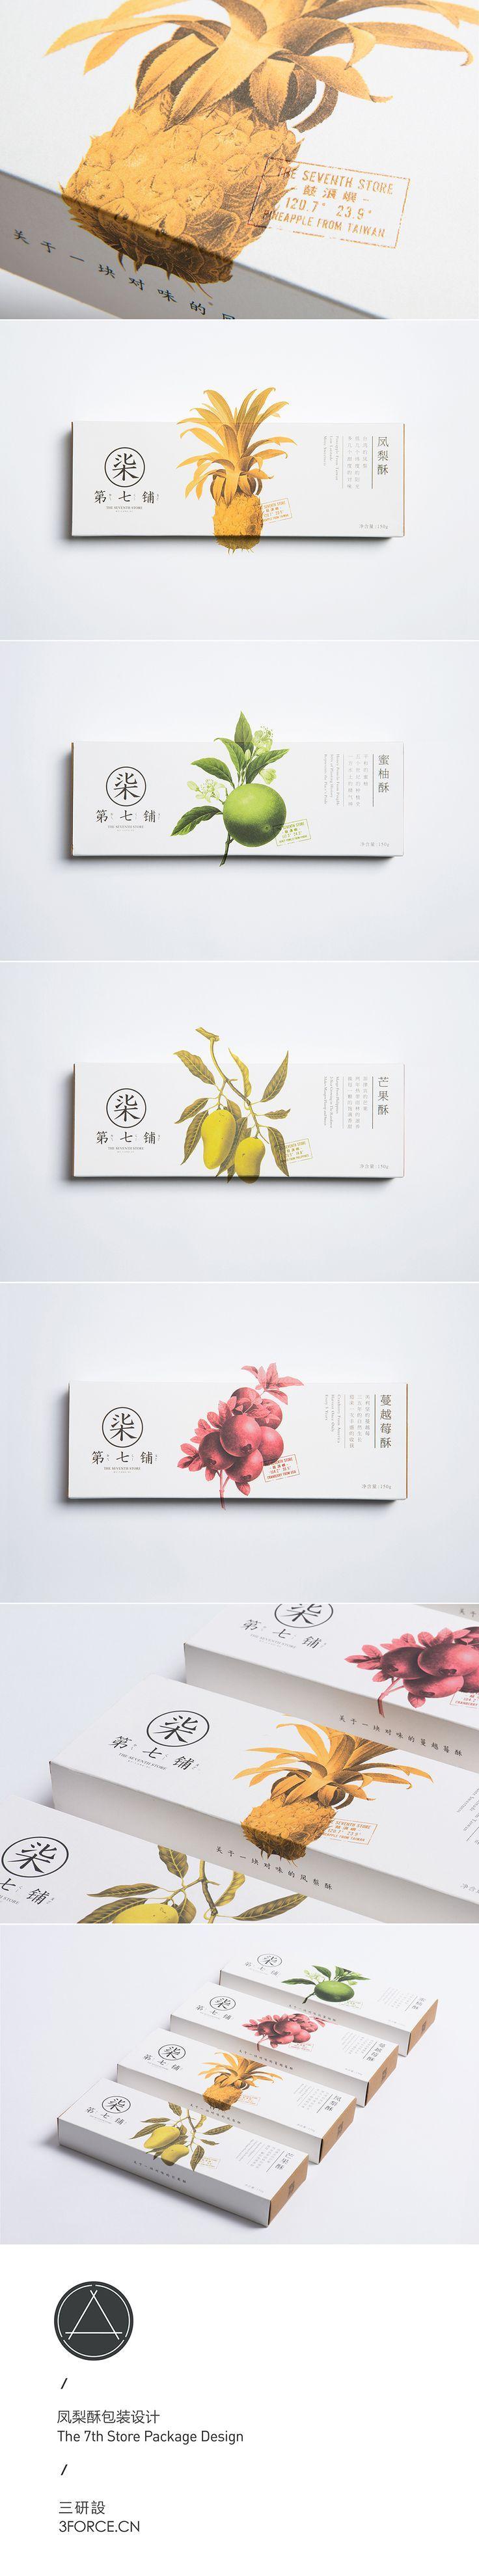 The 7th Store Pineapple Pie Packaging / 第七鋪鳳梨酥系列包裝設計 on Behance